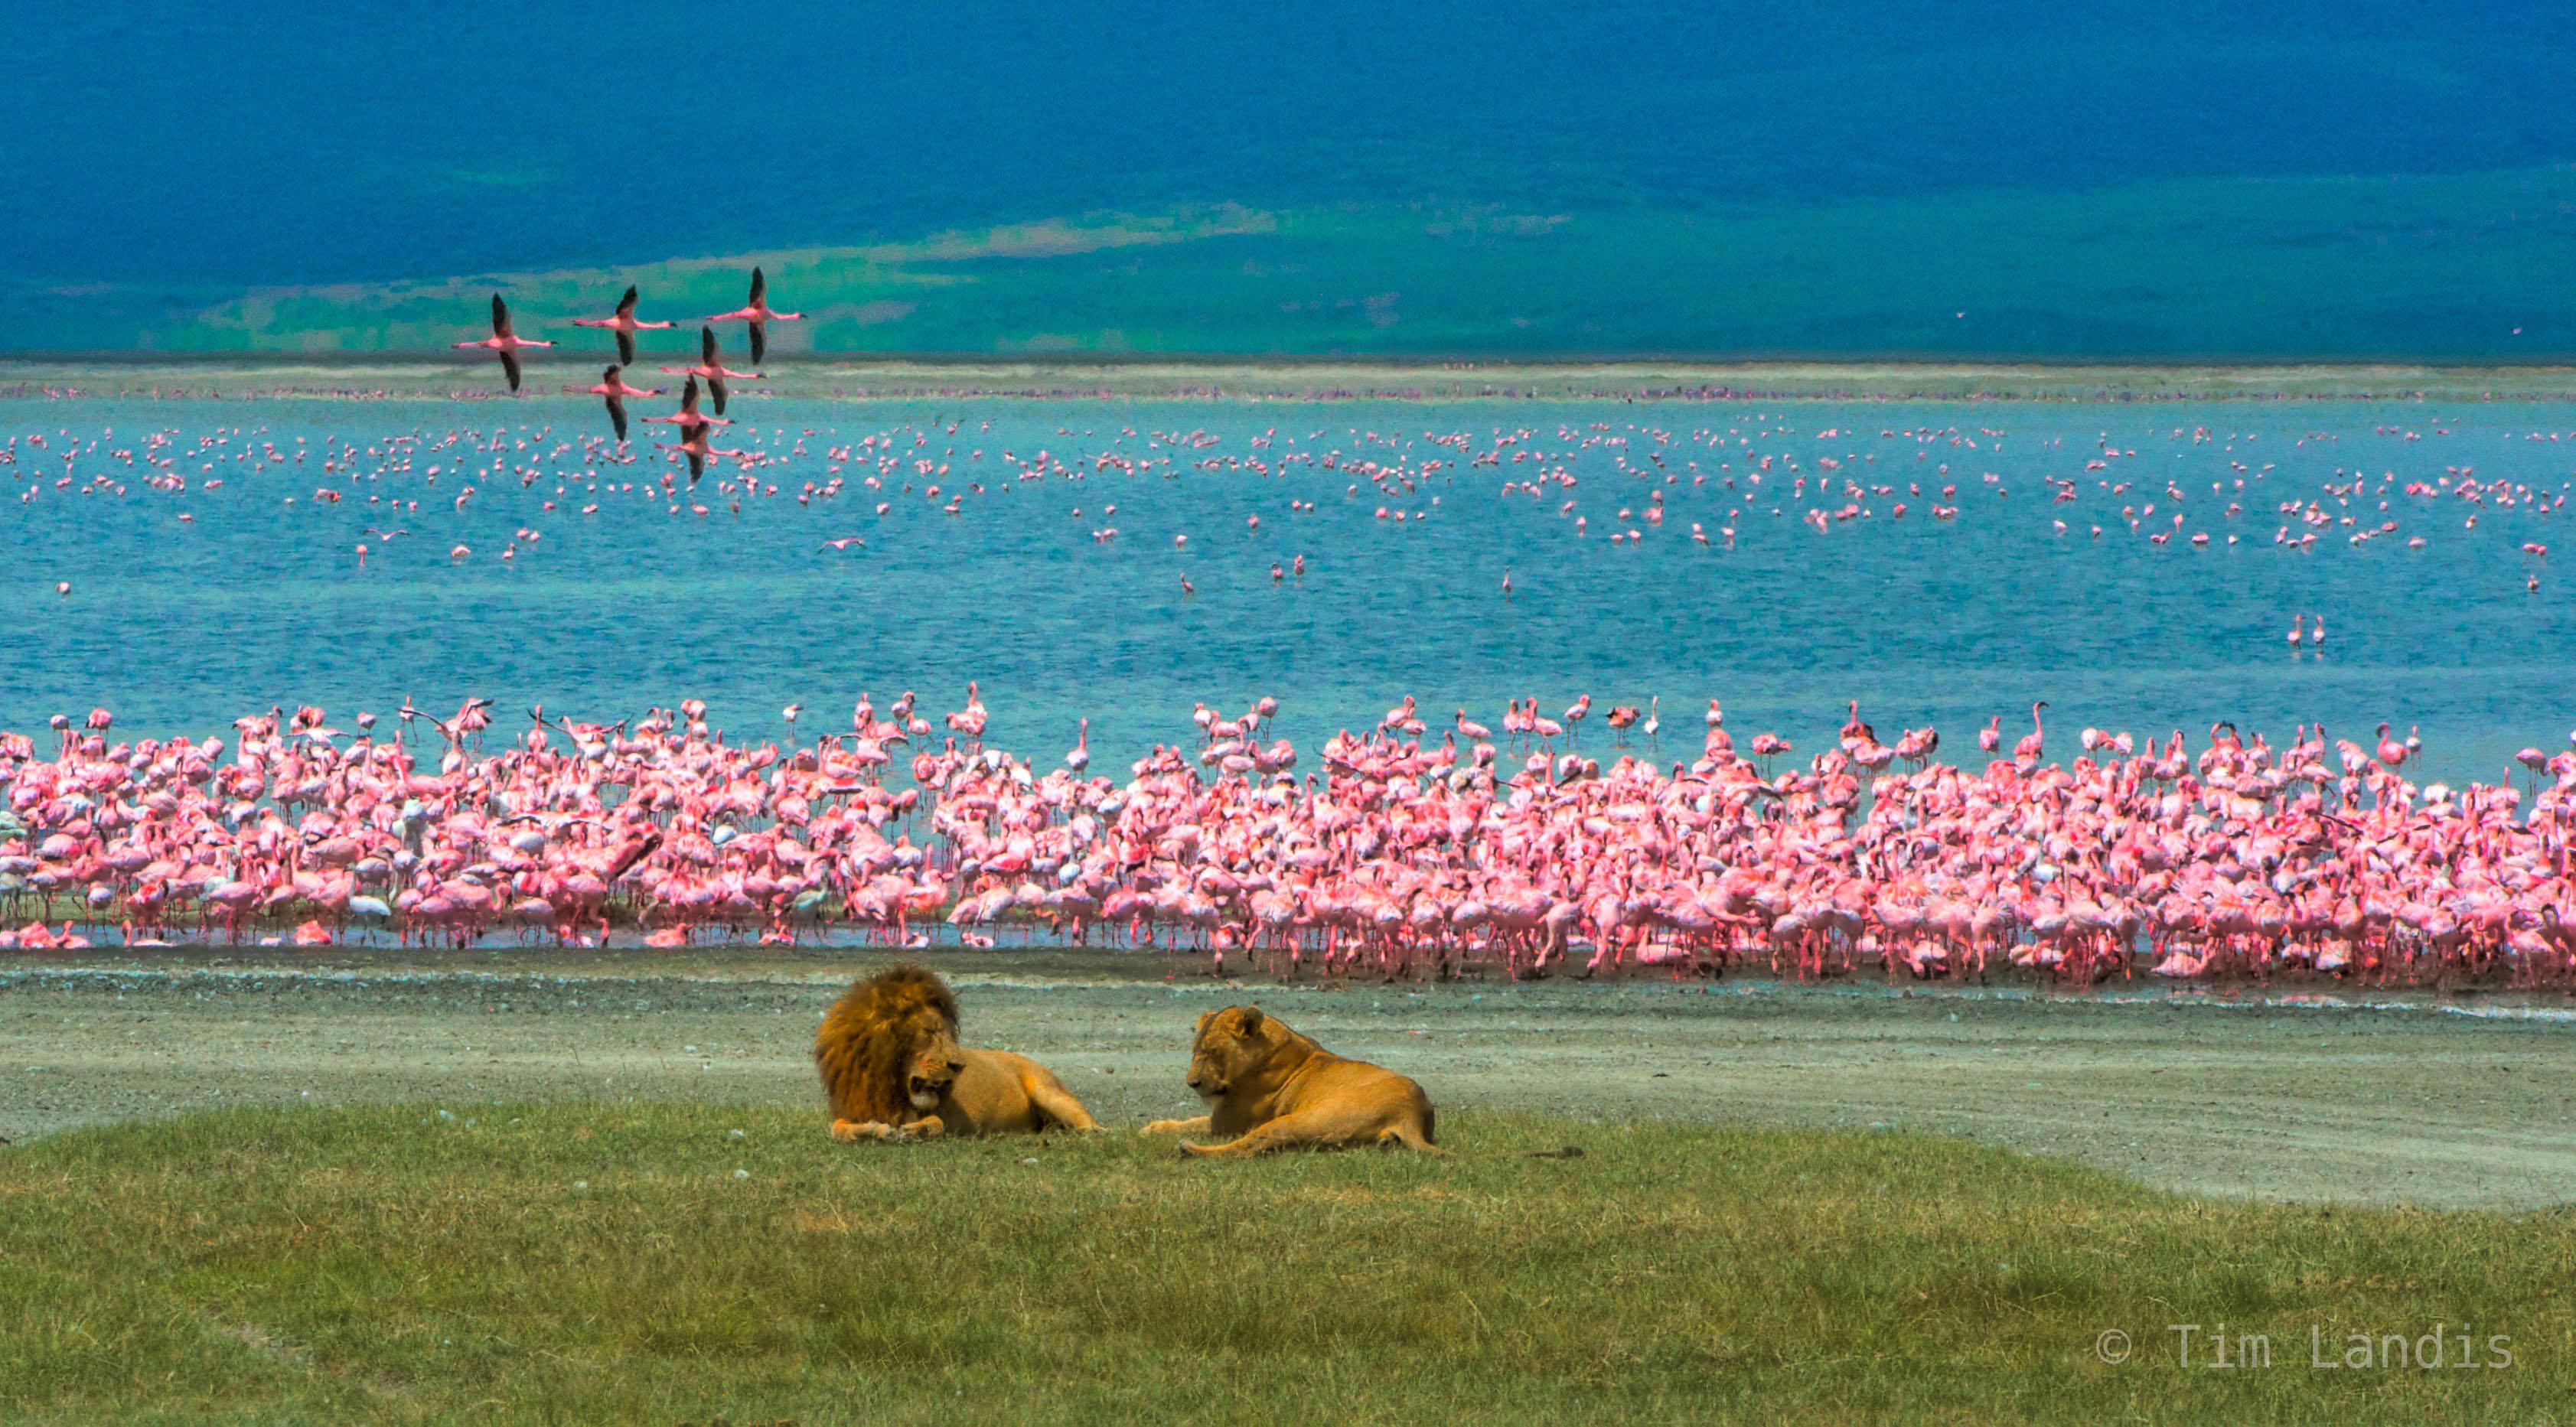 Ngorongoro, flamingos in flight, lesser flamingos, lion, lioness, lions and flamingos, lions mating, tanzania, photo